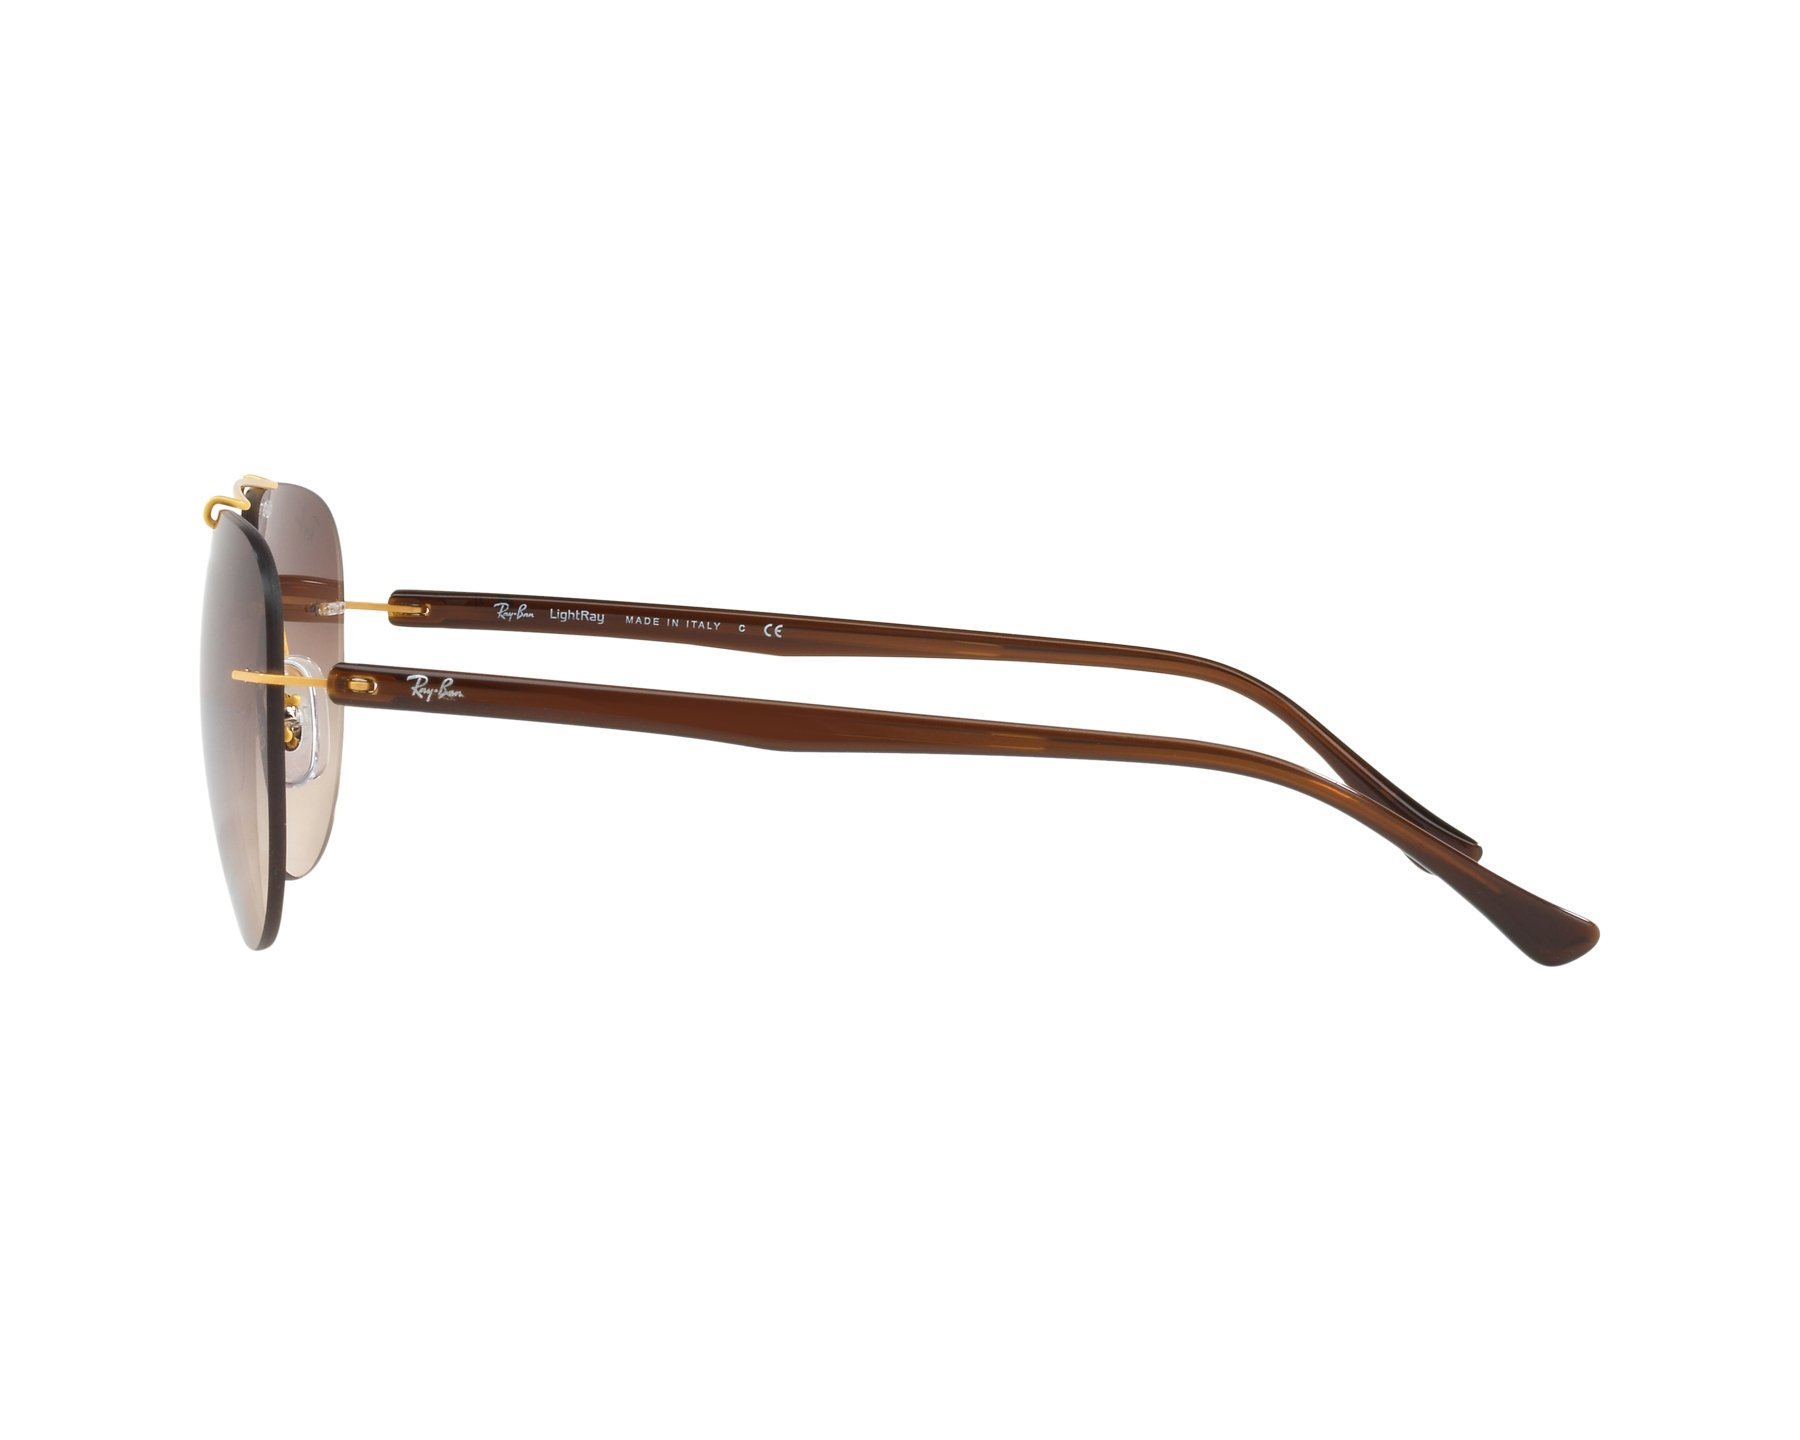 Sunglasses Ray-Ban RB-8059 157 13 57-16 Gold Brown 360 b2609754d36b